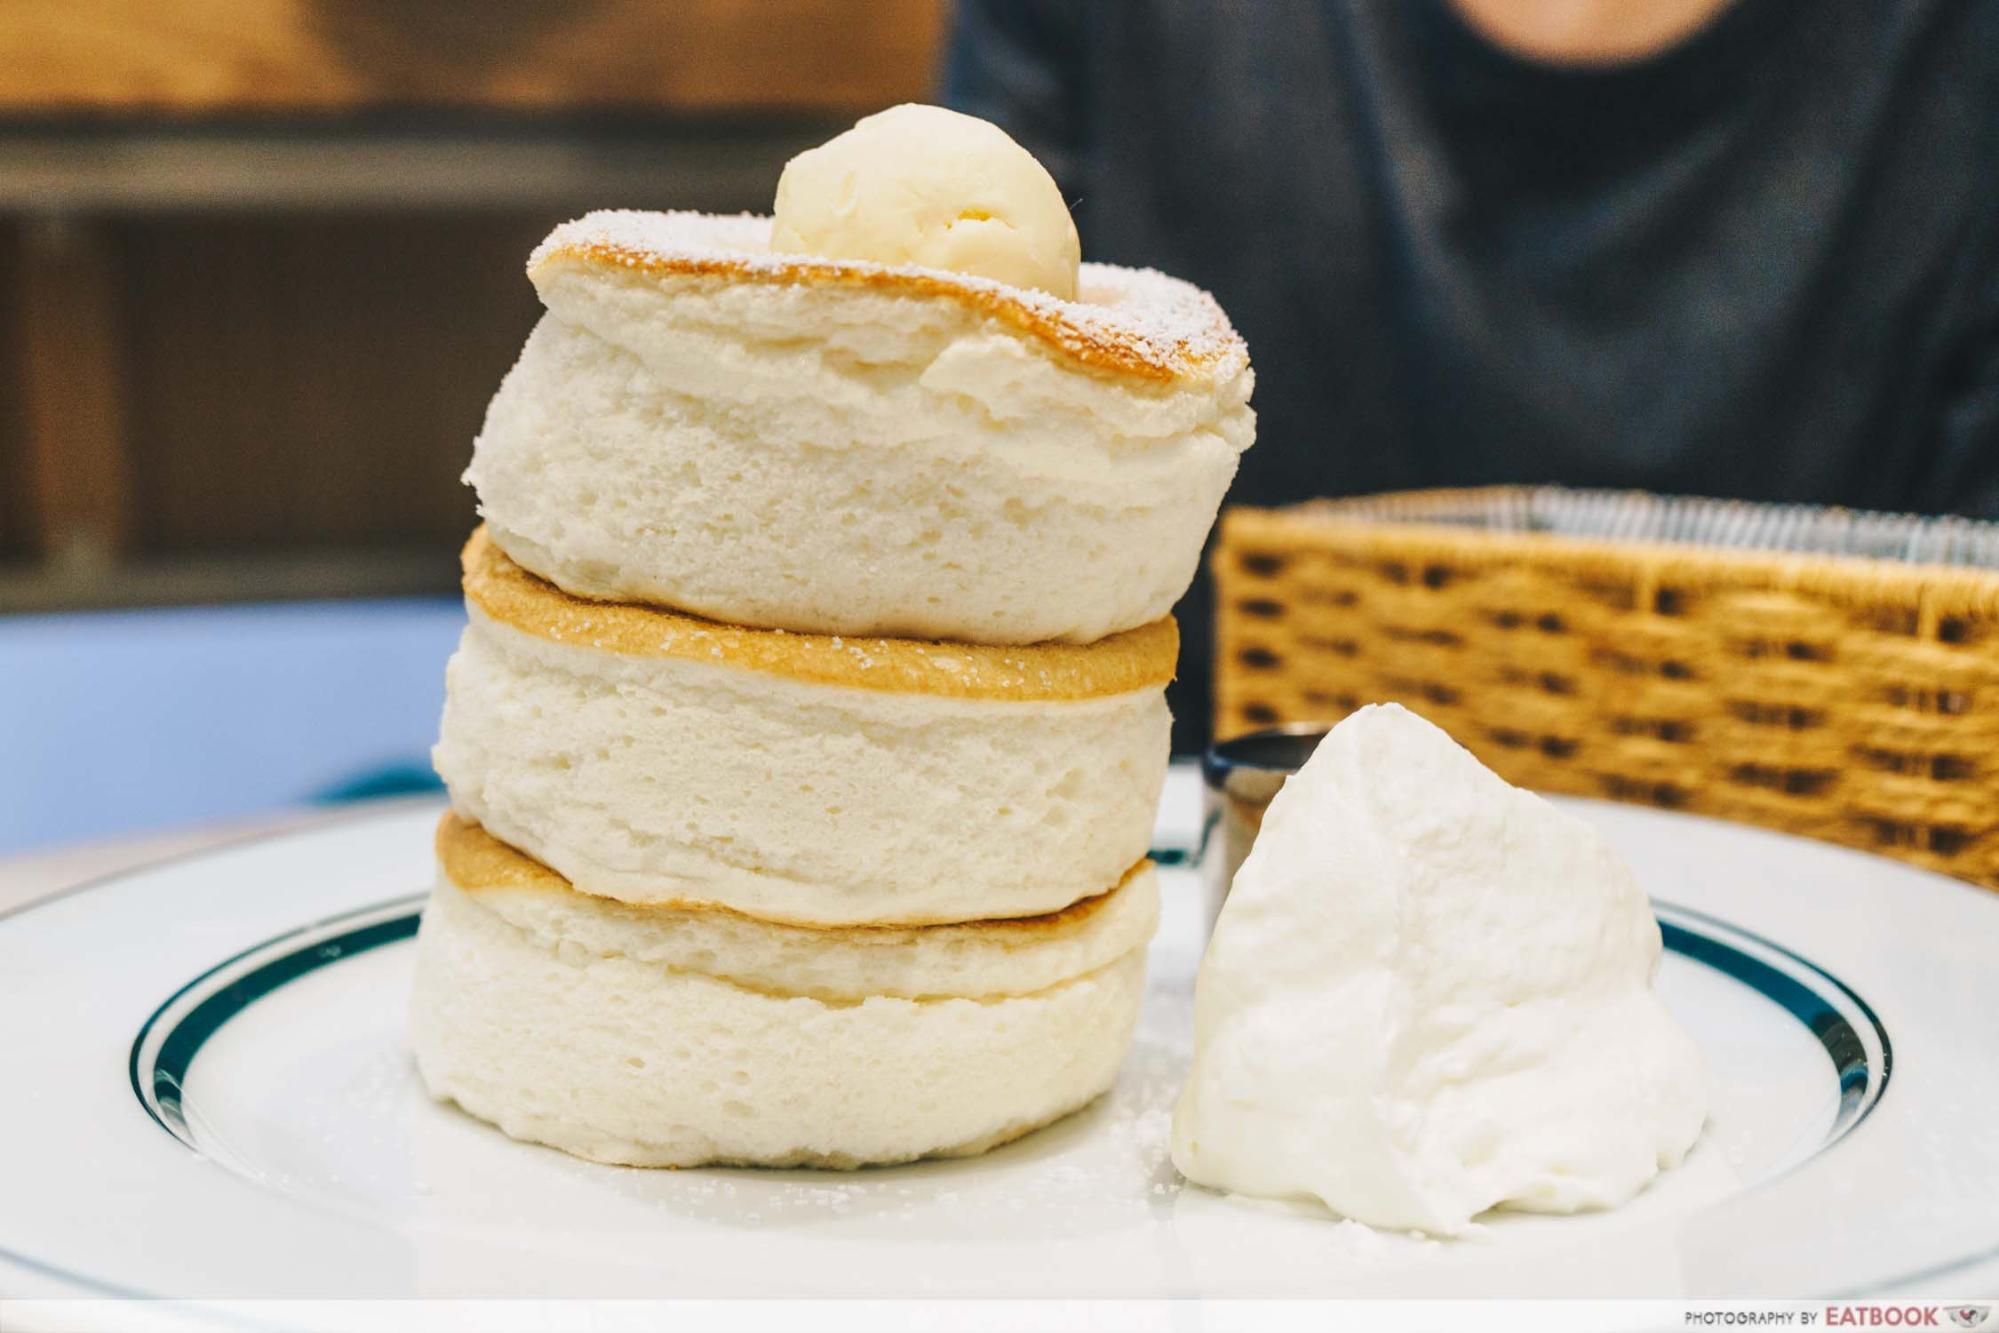 Gram Cafe & Pancakes vivo Premium Pancakes 1